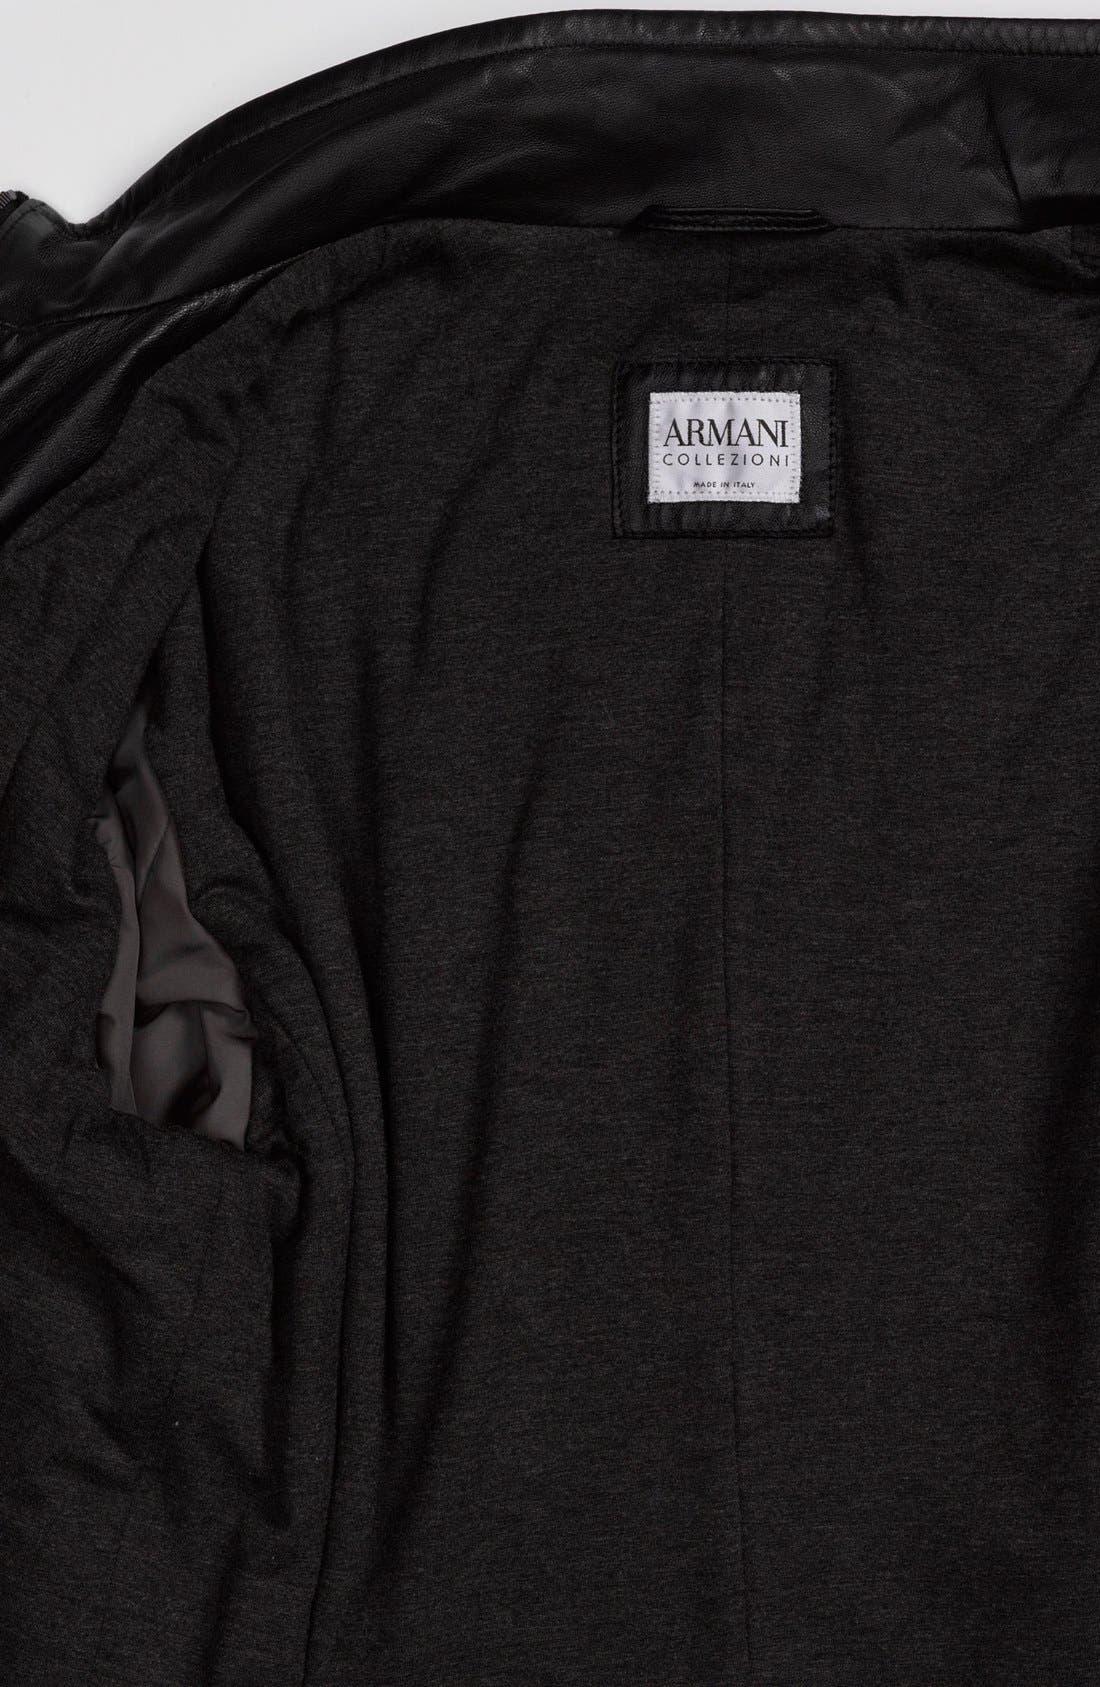 EMPORIO ARMANI,                             Armani Collezioni Blouson Leather Jacket,                             Alternate thumbnail 5, color,                             001